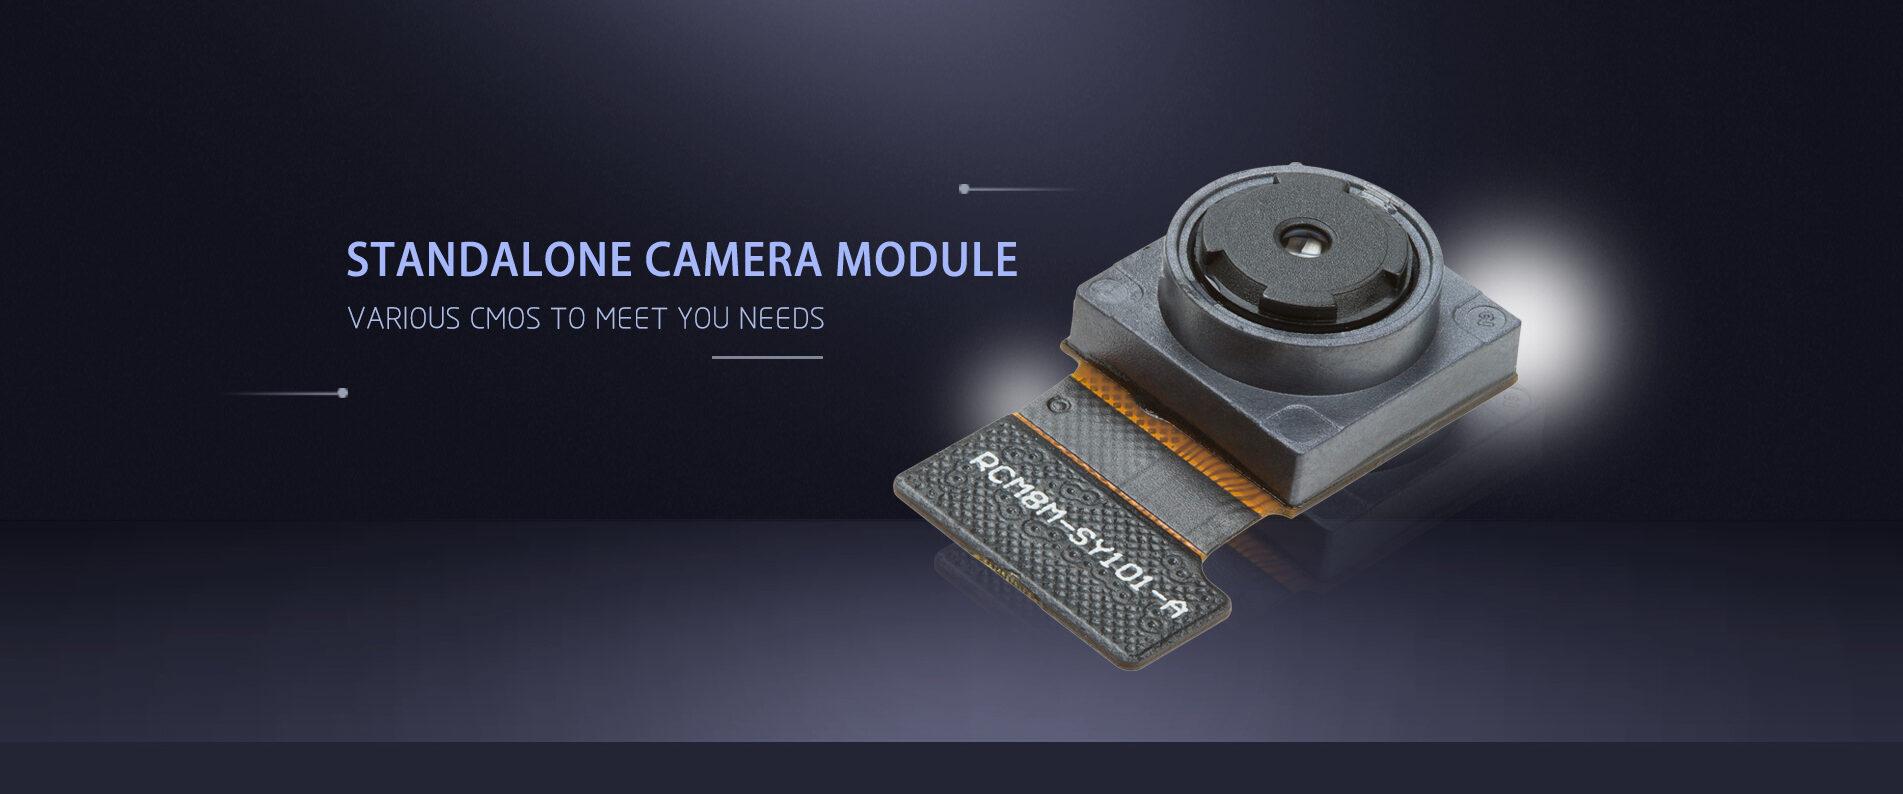 arducam-standalone-camera-module-banner-slider